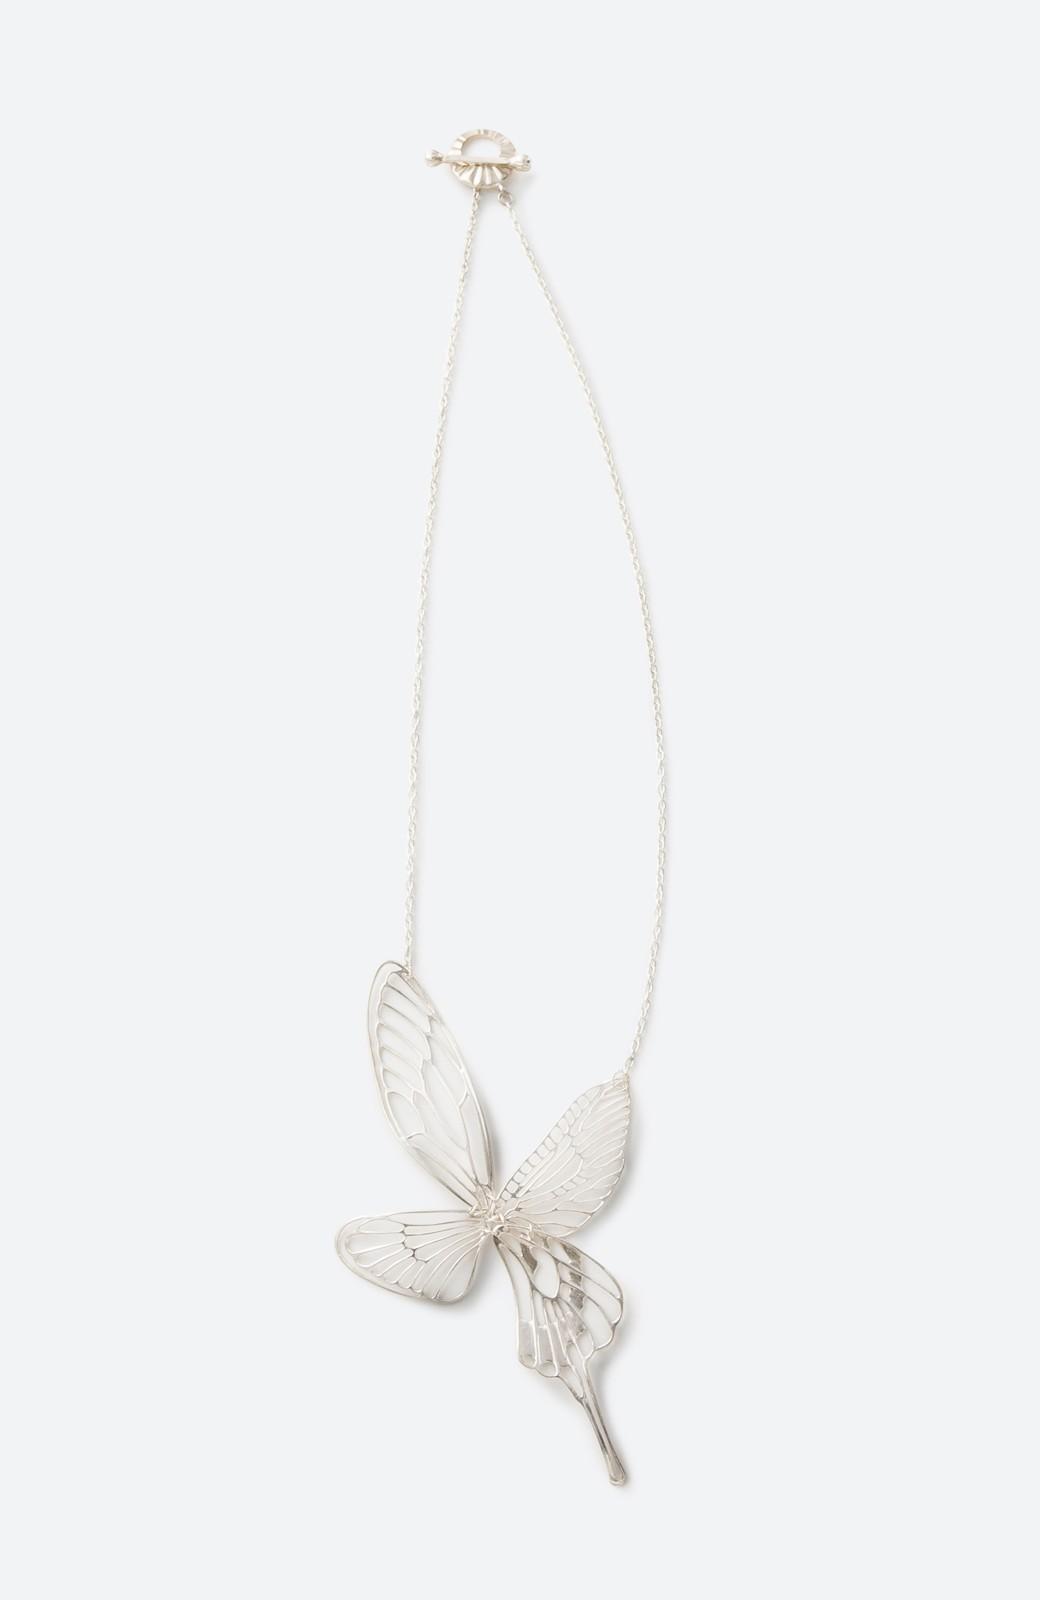 haco! てとひとて MARZO DERICATE AIR 昆虫の羽シルバーネックレス <シルバー>の商品写真2